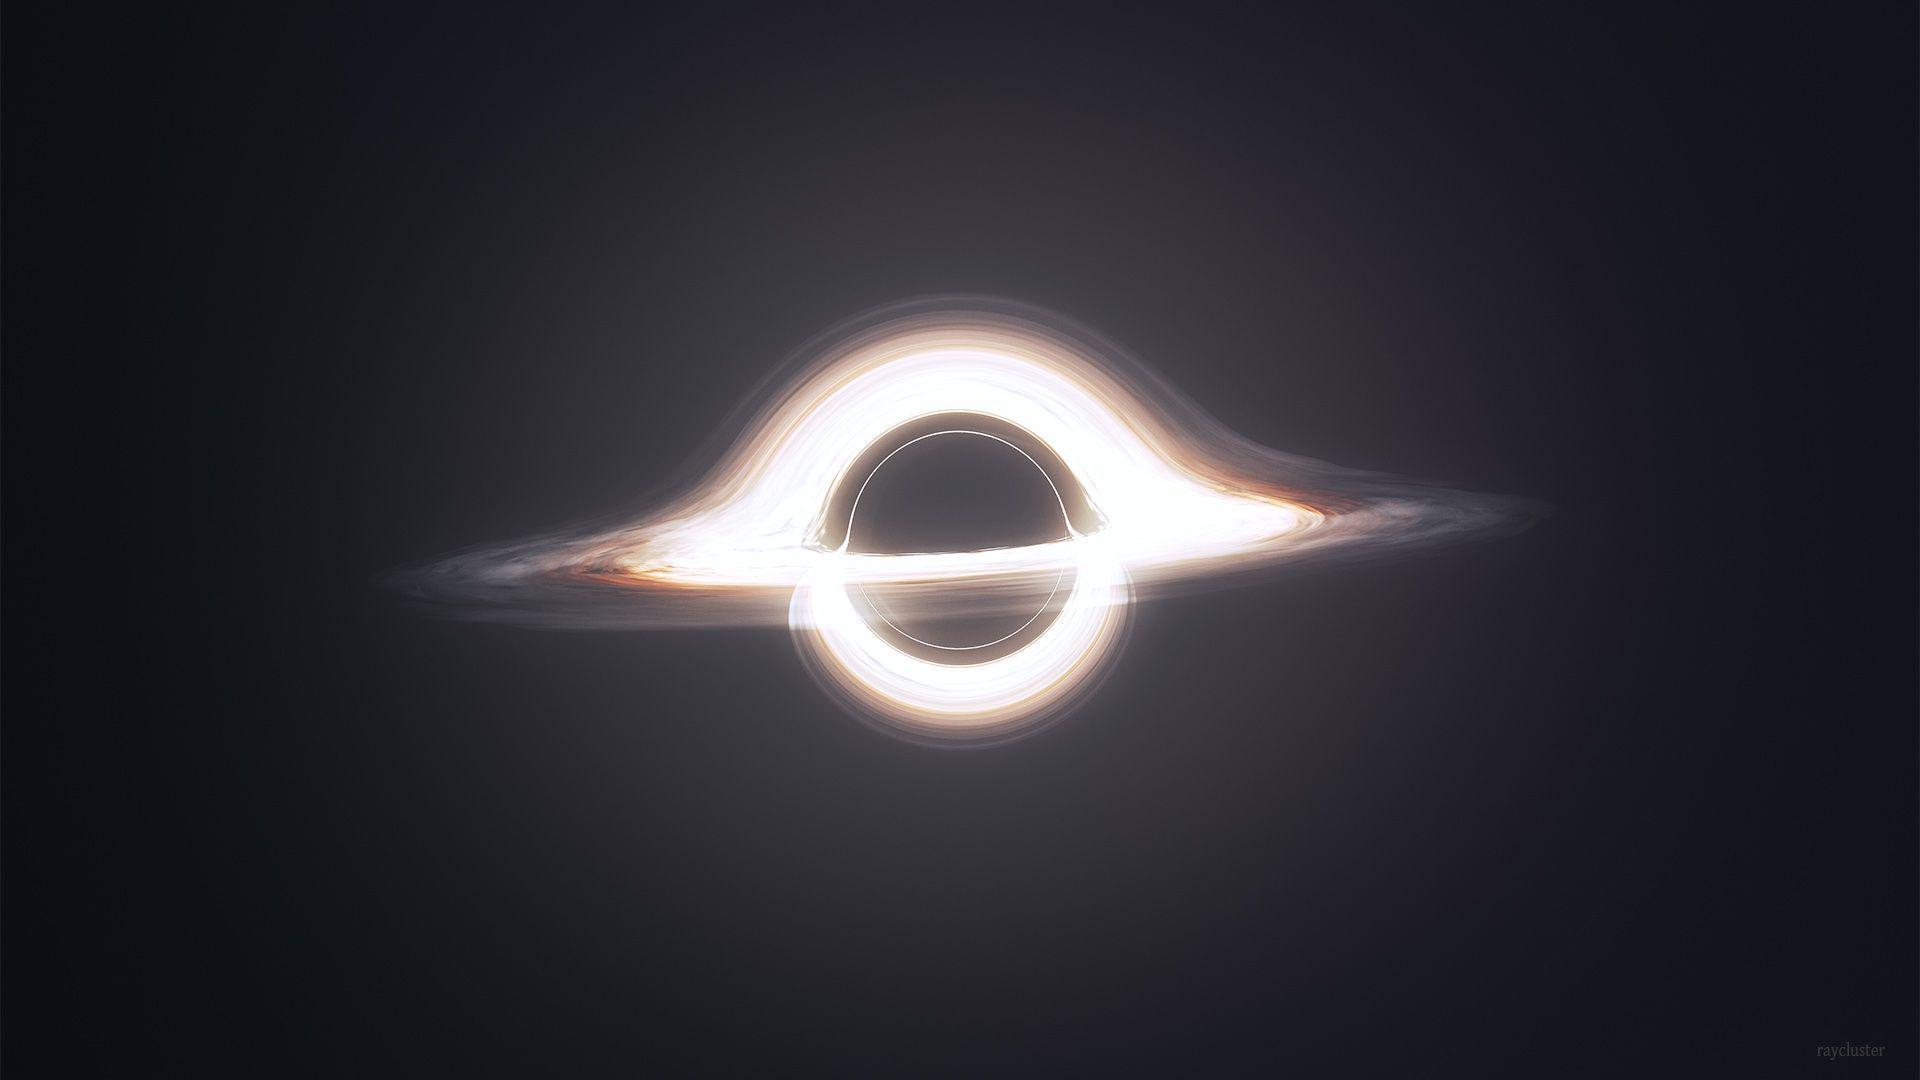 Supermassive Black Hole Wallpapers - Top Free Supermassive Black